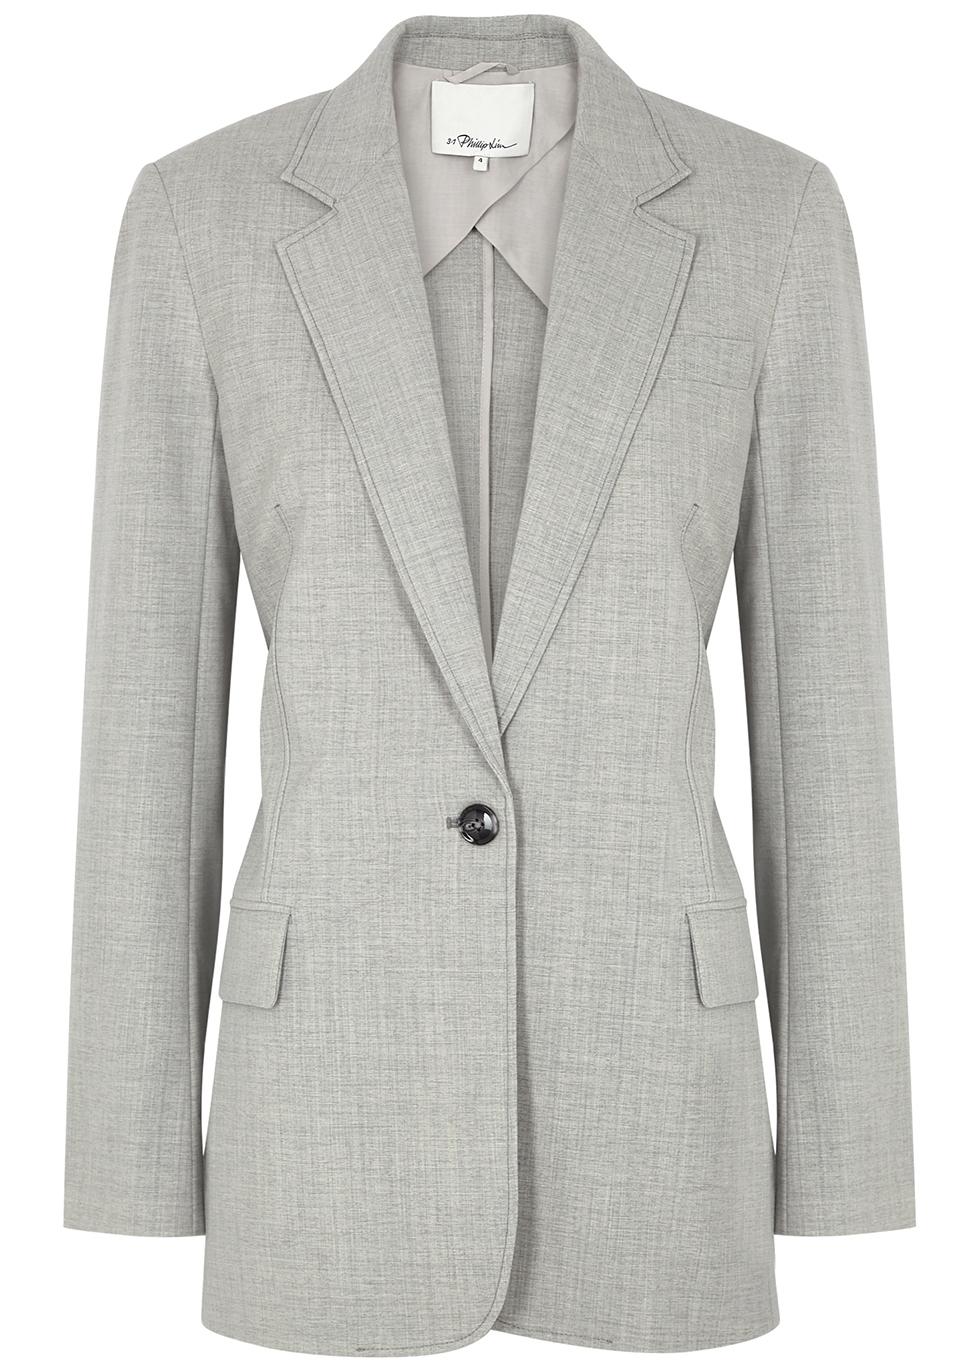 Grey wool-blend blazer